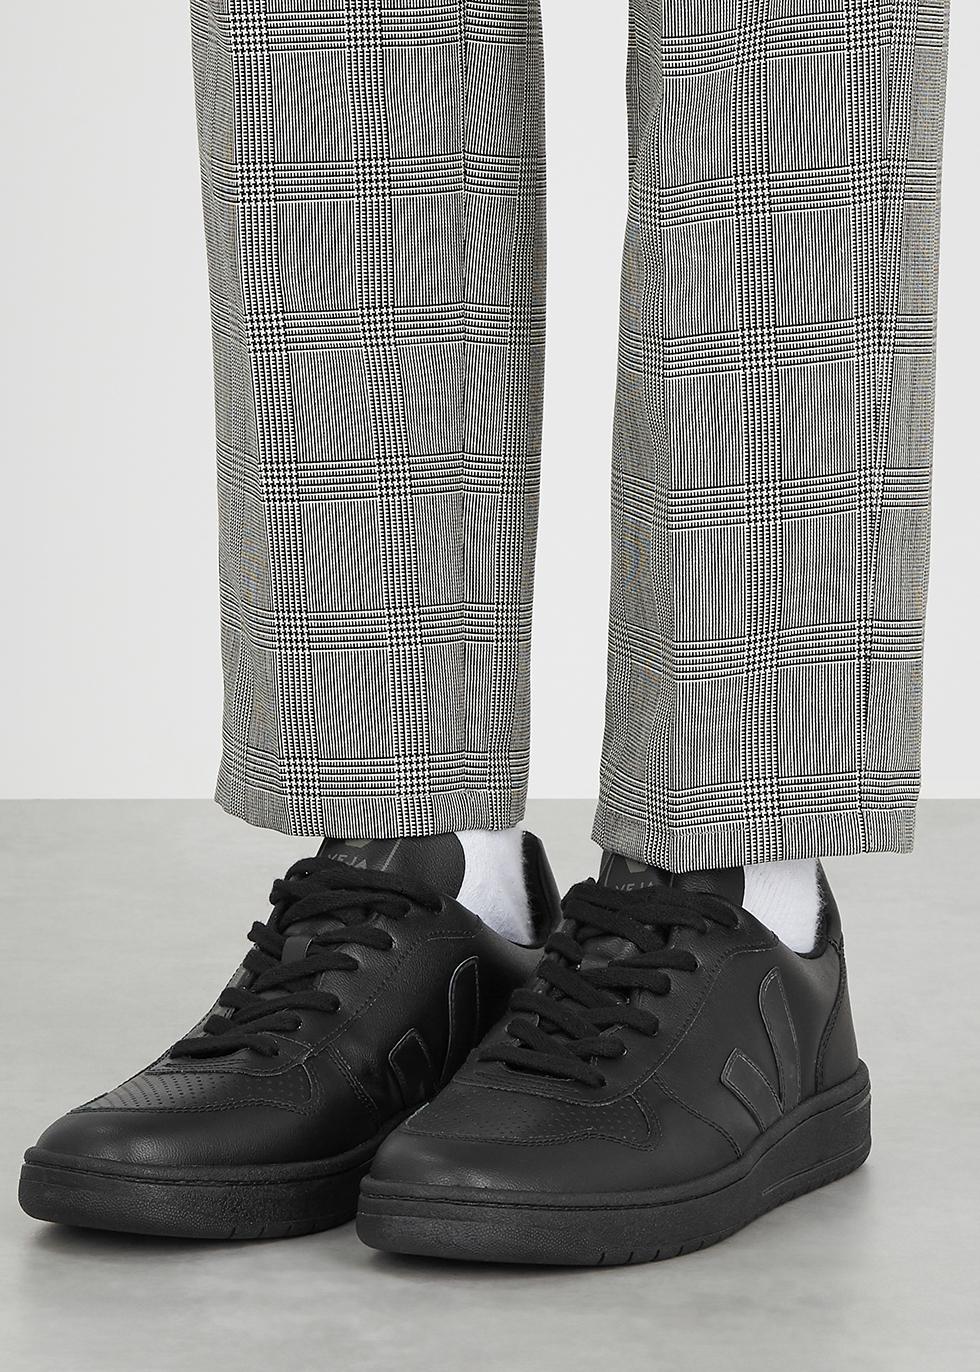 Veja V-10 black faux leather sneakers